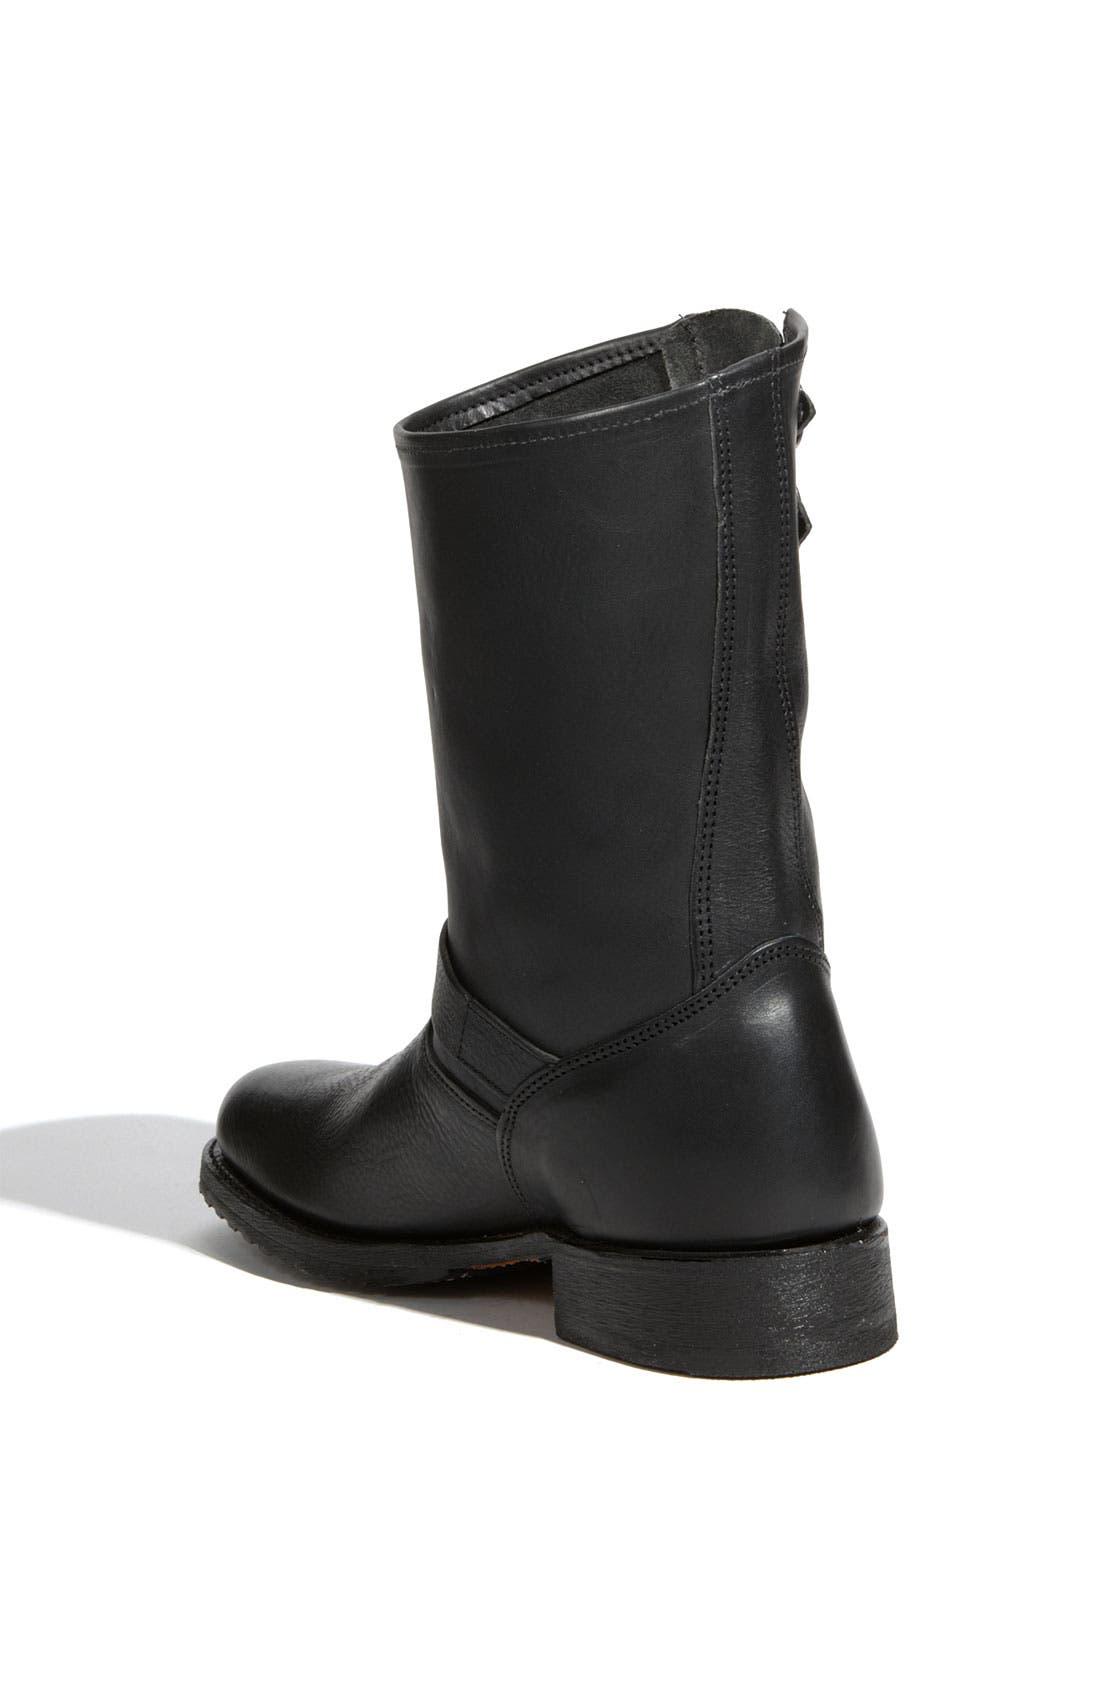 Alternate Image 3  - Frye 'Rand' Engineer Boot (Men)